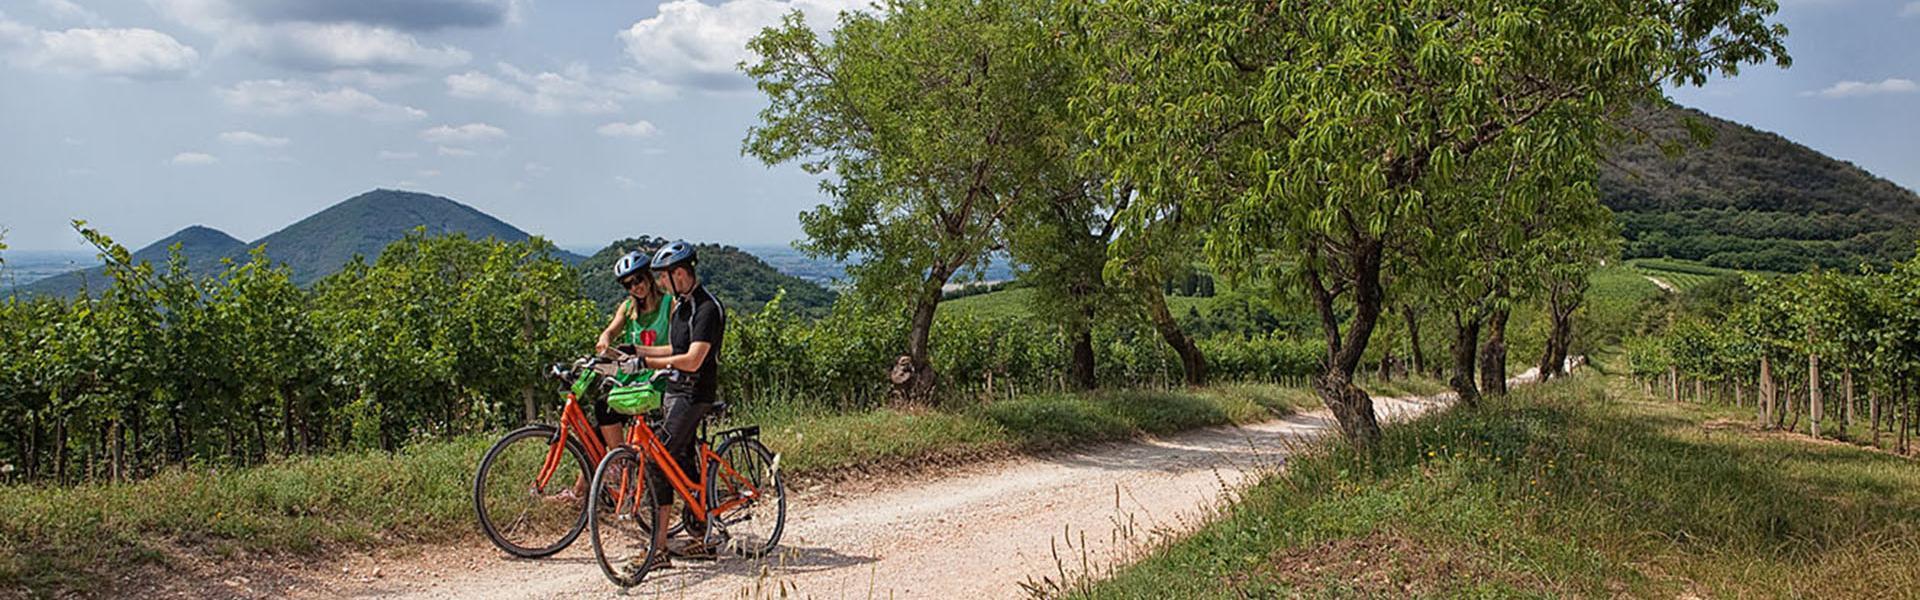 Padova Travel Bike ©M. Danesin